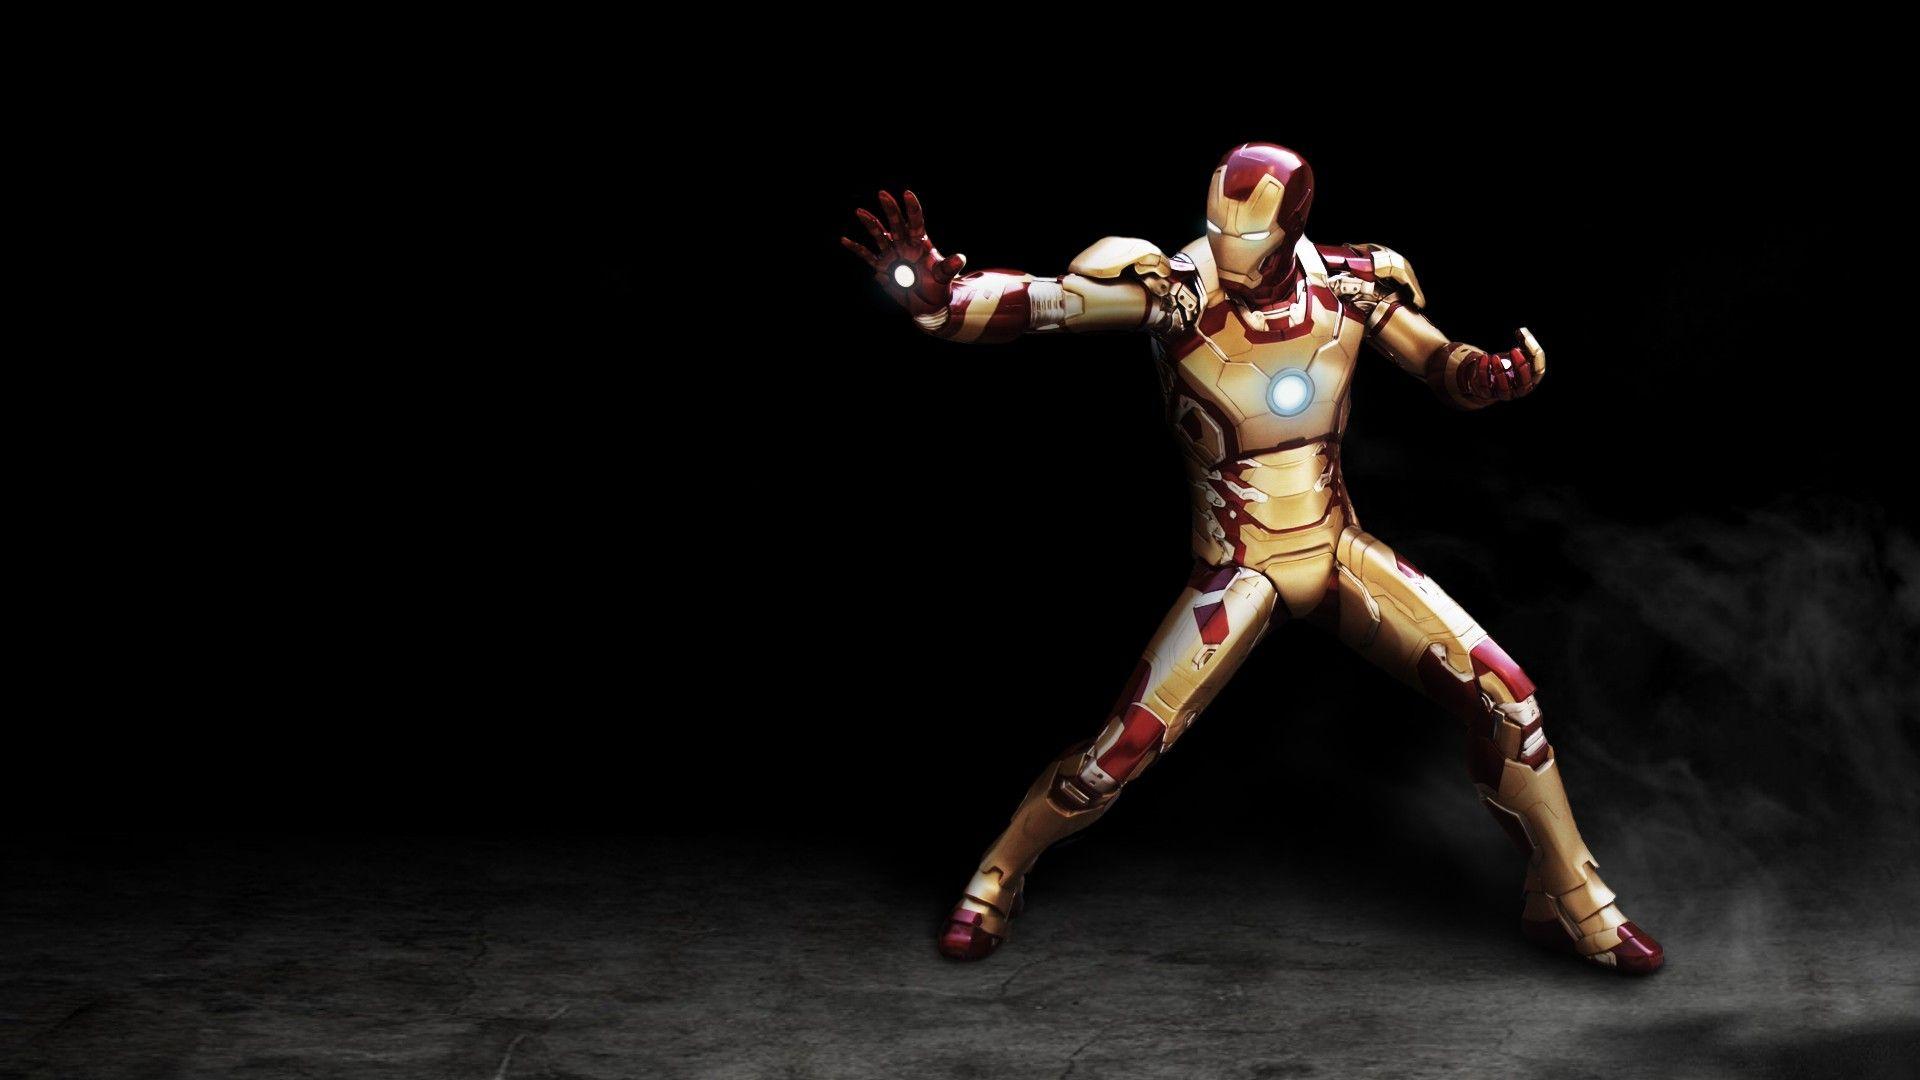 Mark 42 Iron Man 3 Background Hd Wallpaper Things To Wear Iron